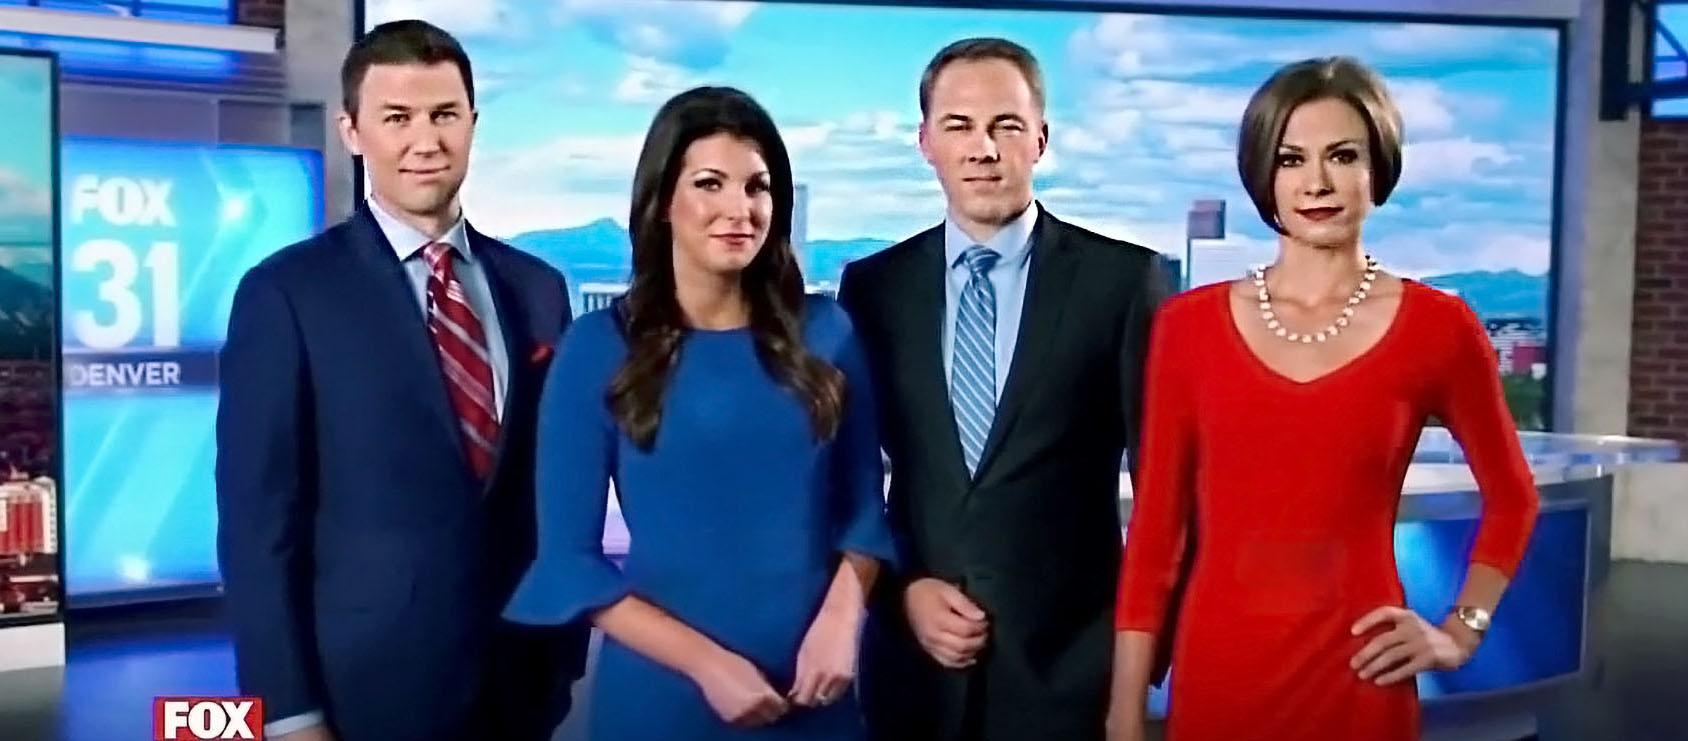 Brooks Garner, Megan O'Halloran, Kirk Yuhnke,and Sam Boik at Fox News Denver